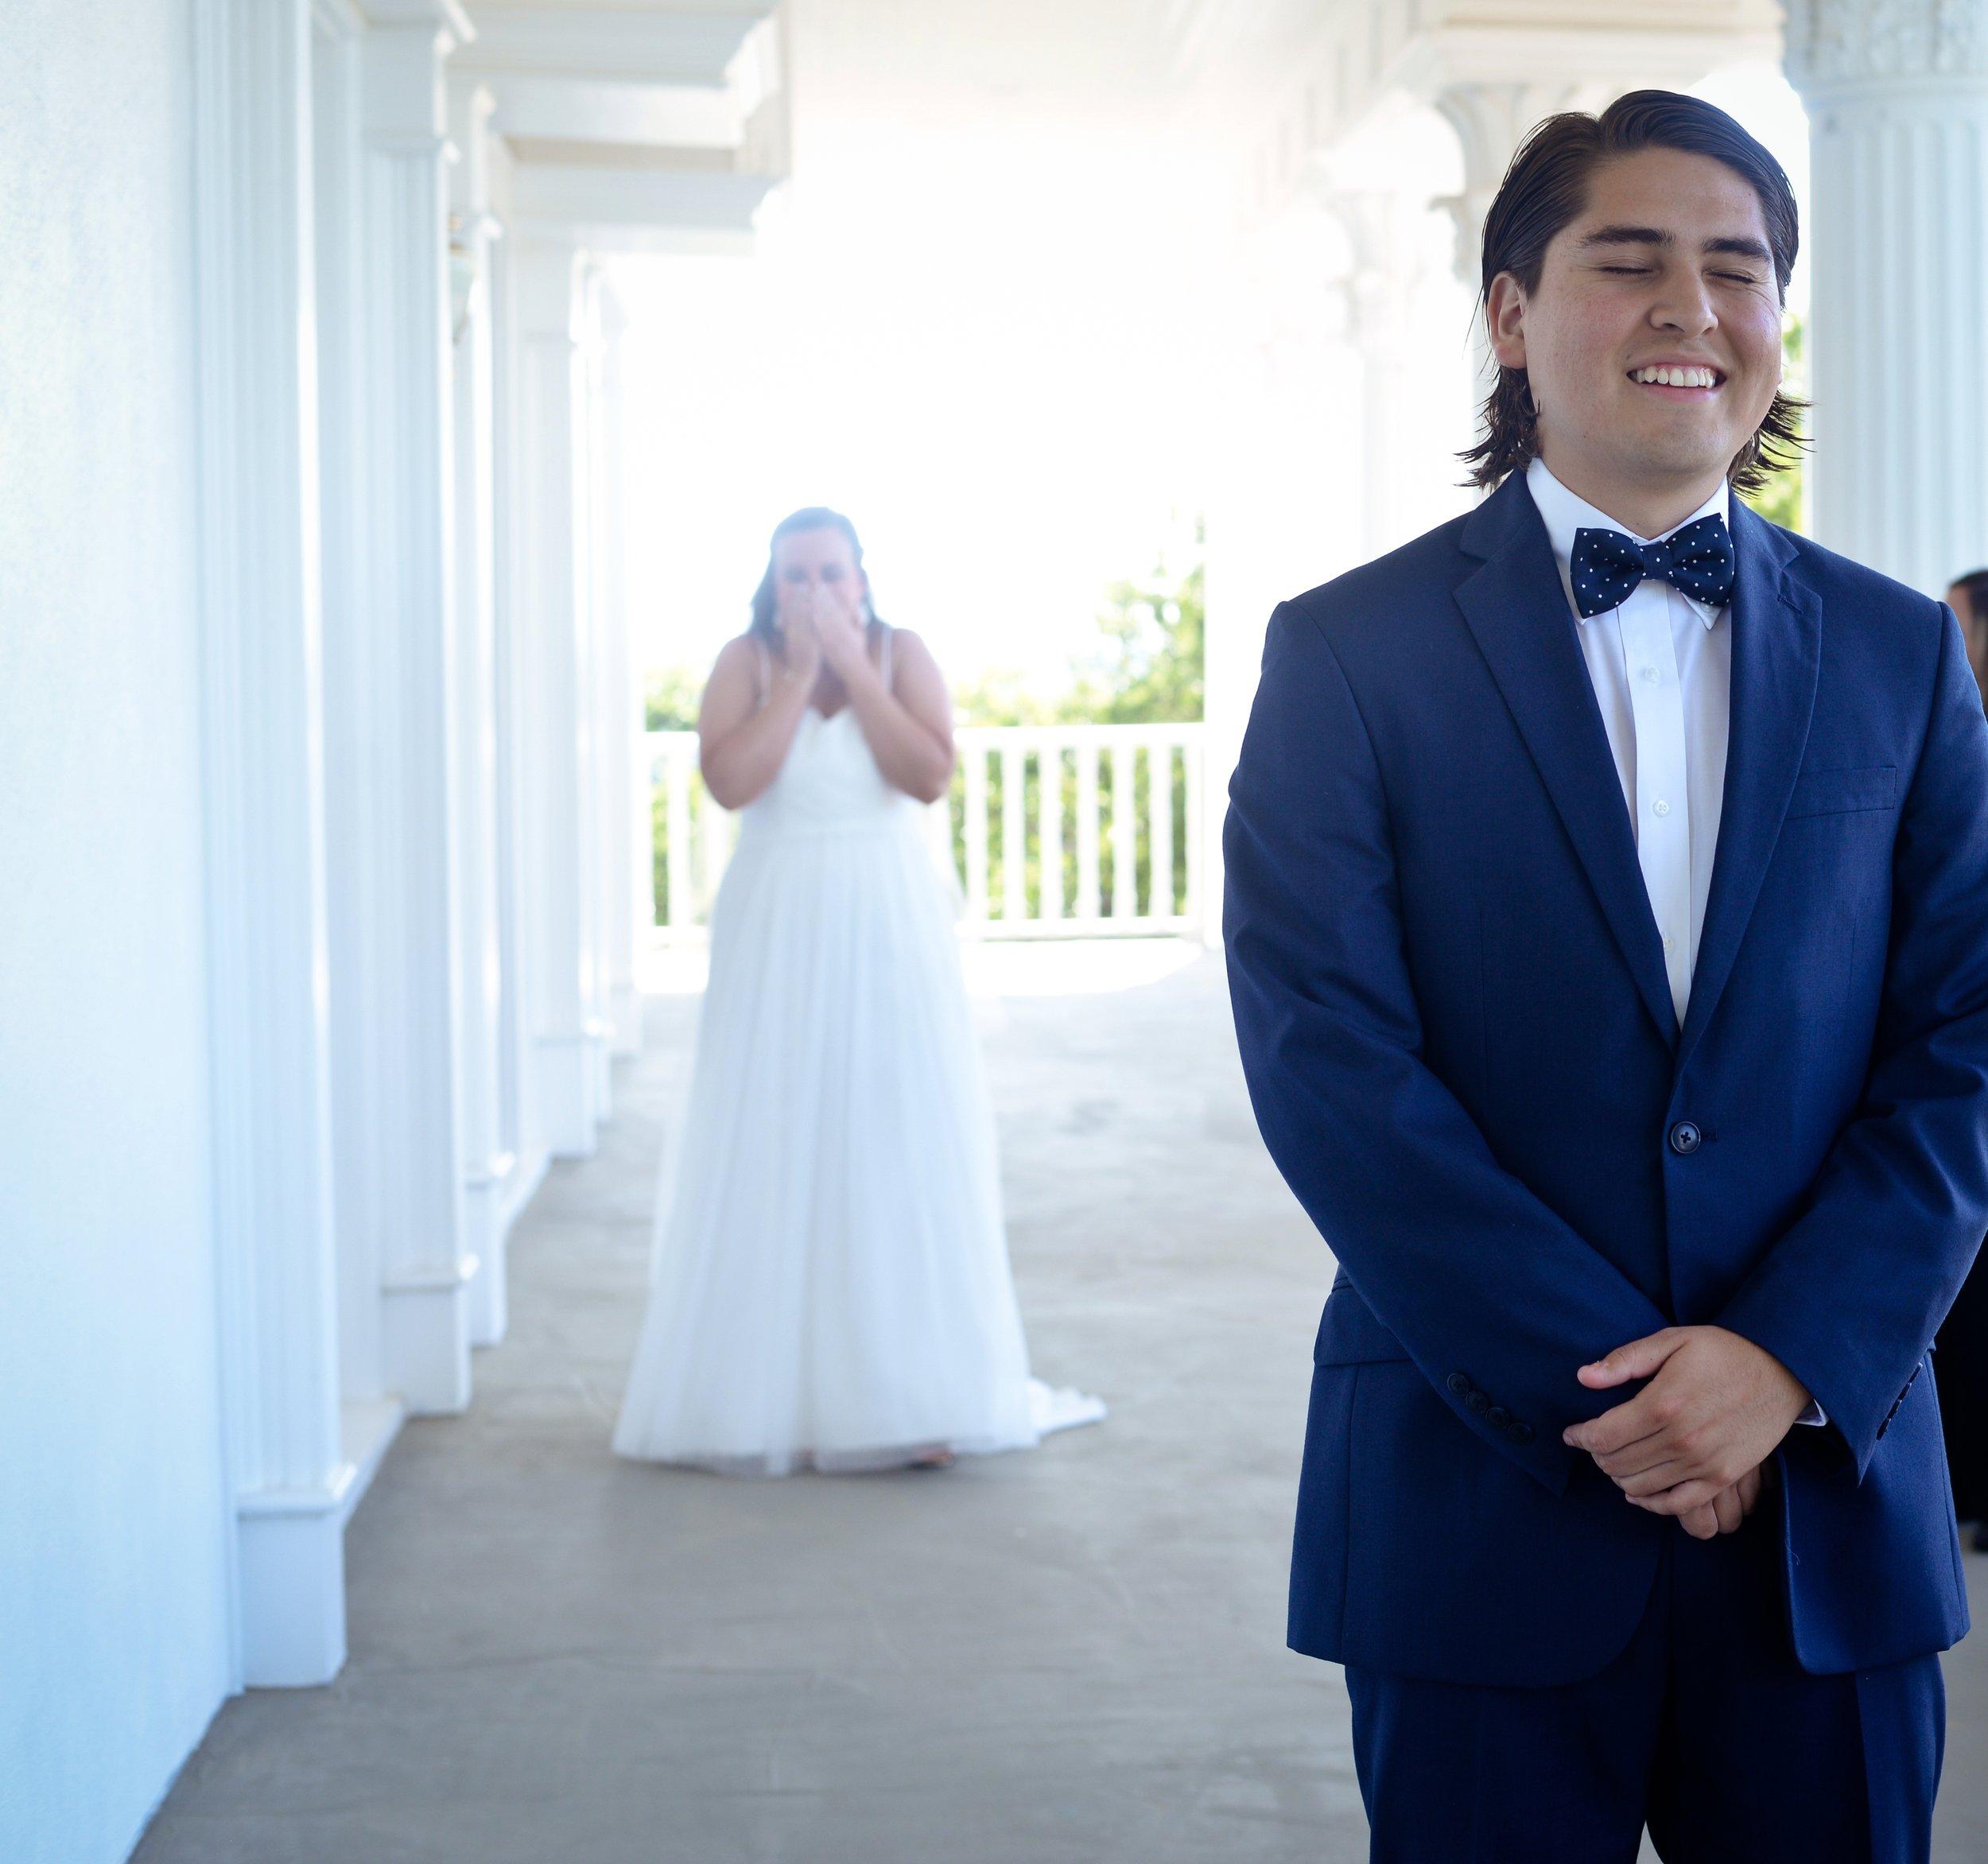 Lonestar-Mansion-Fort-Worth-Wedding-Planner-Burleson-Wedding-Venue_08.jpg